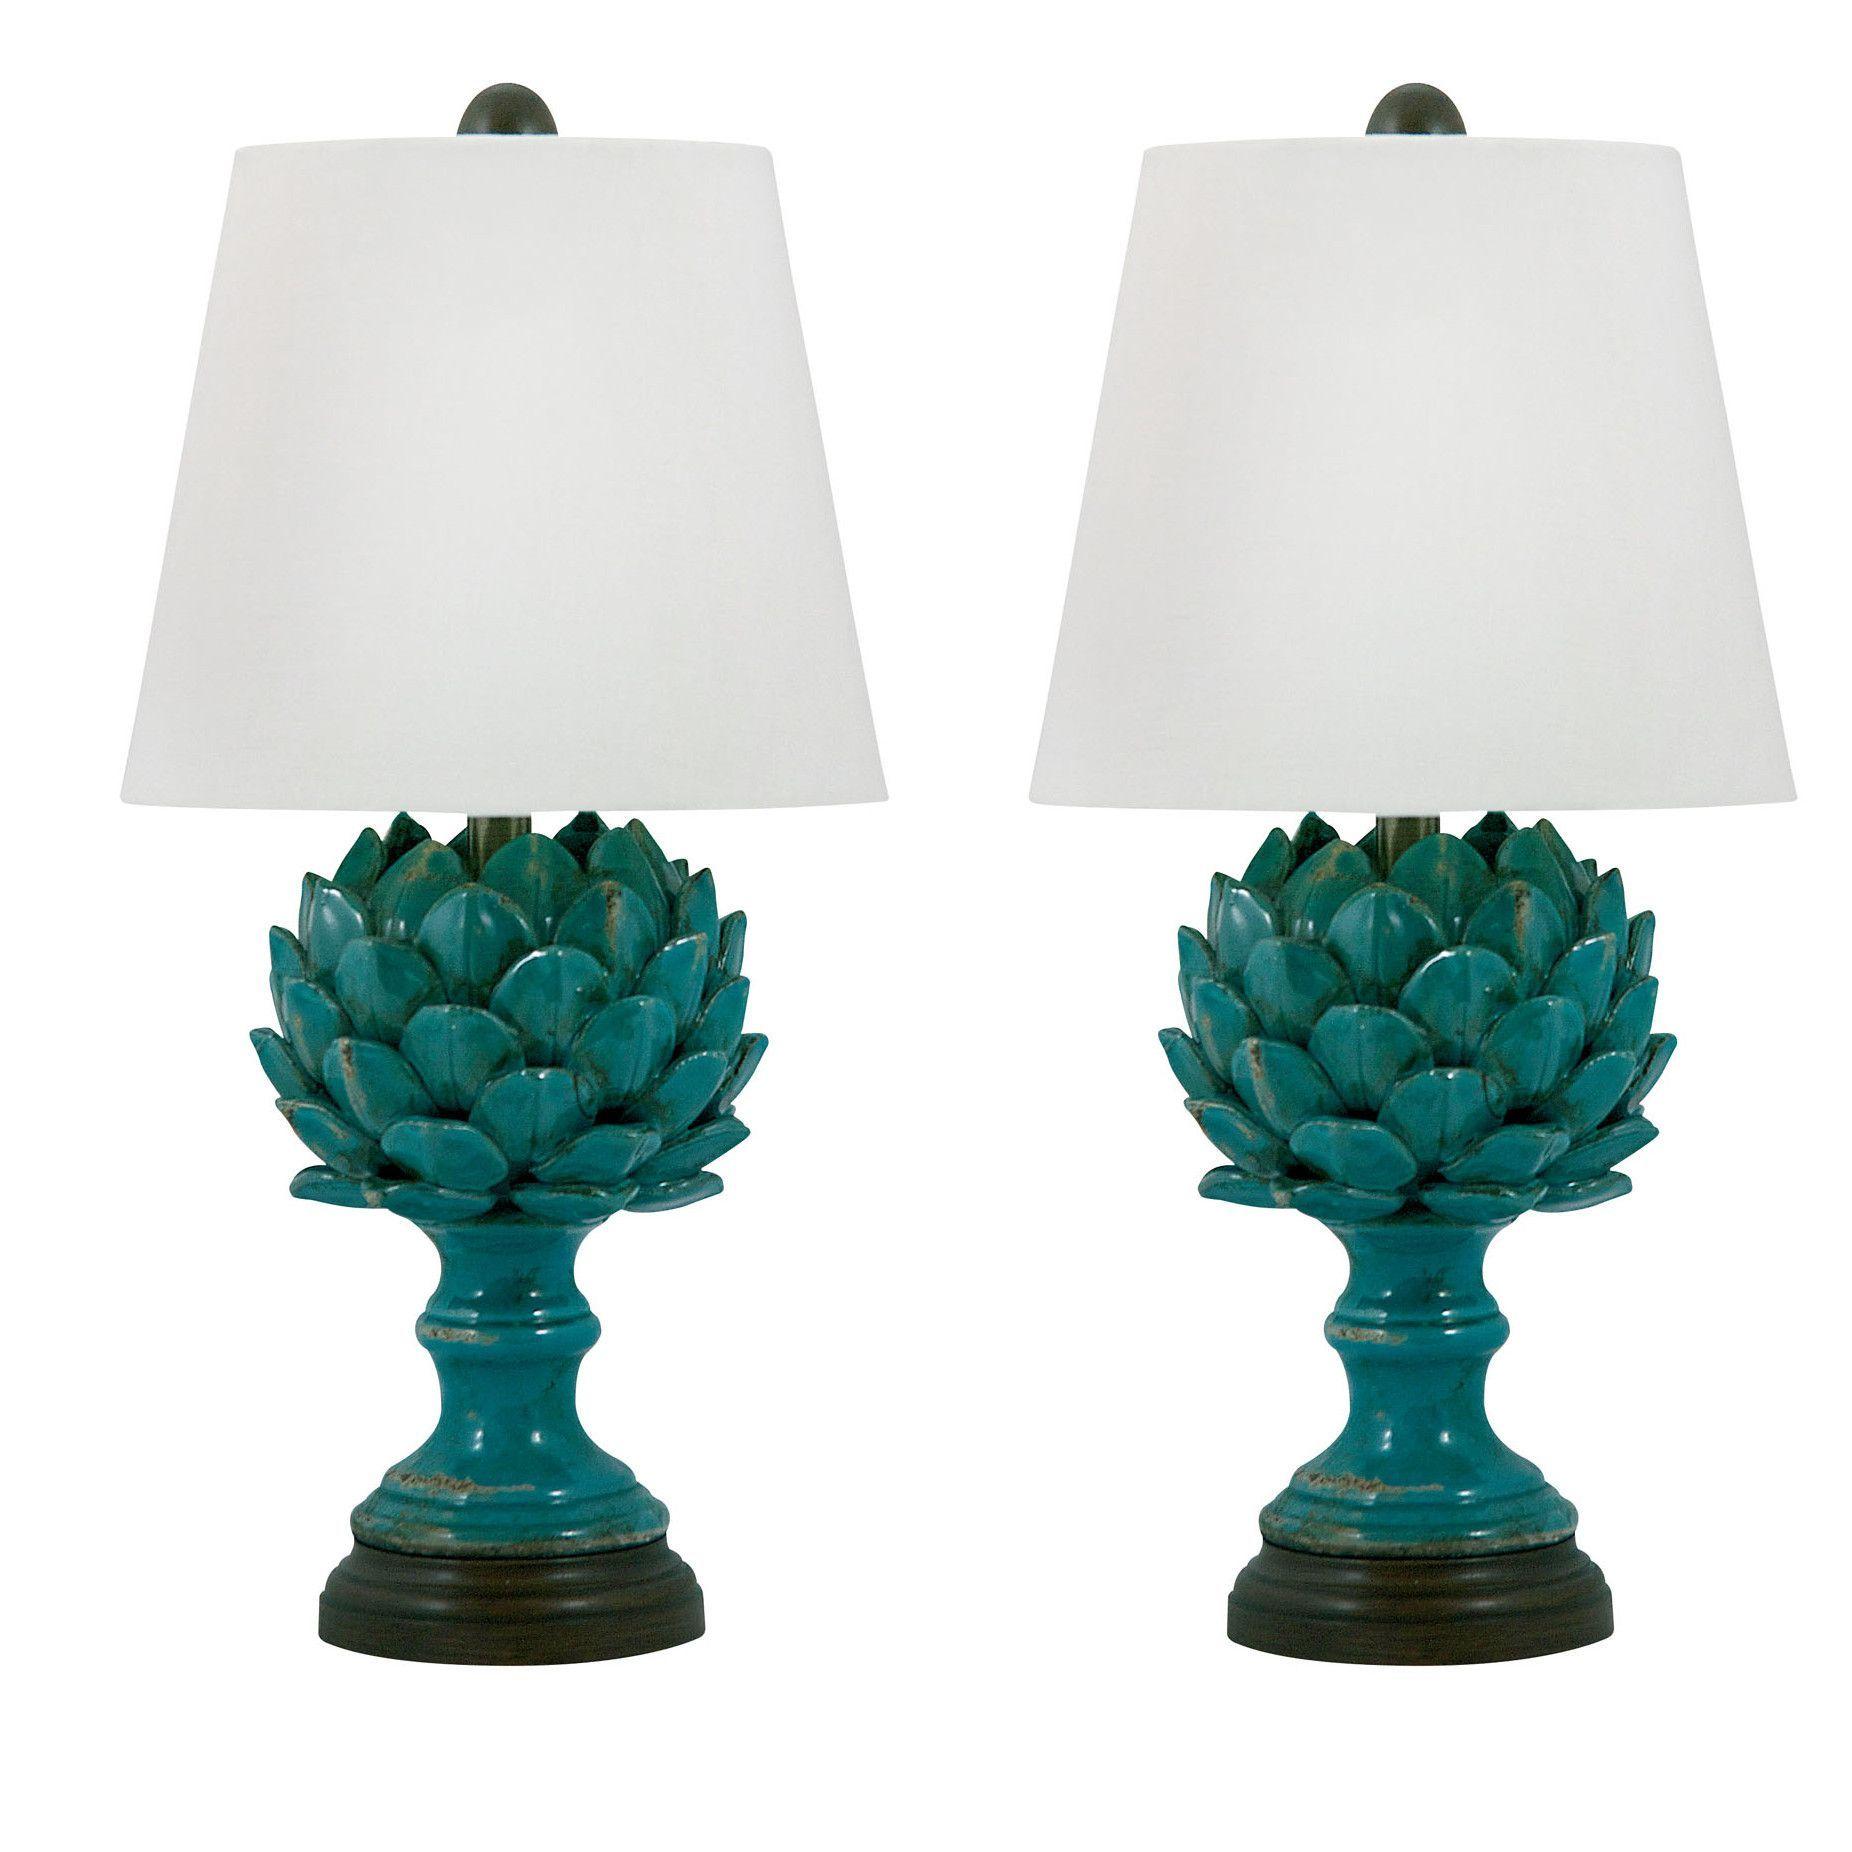 Delightful Lamp Works, Table Lamps, Lamp Works 223 Led Terra Cotta Artichoke Led Table  Lamp In Blue